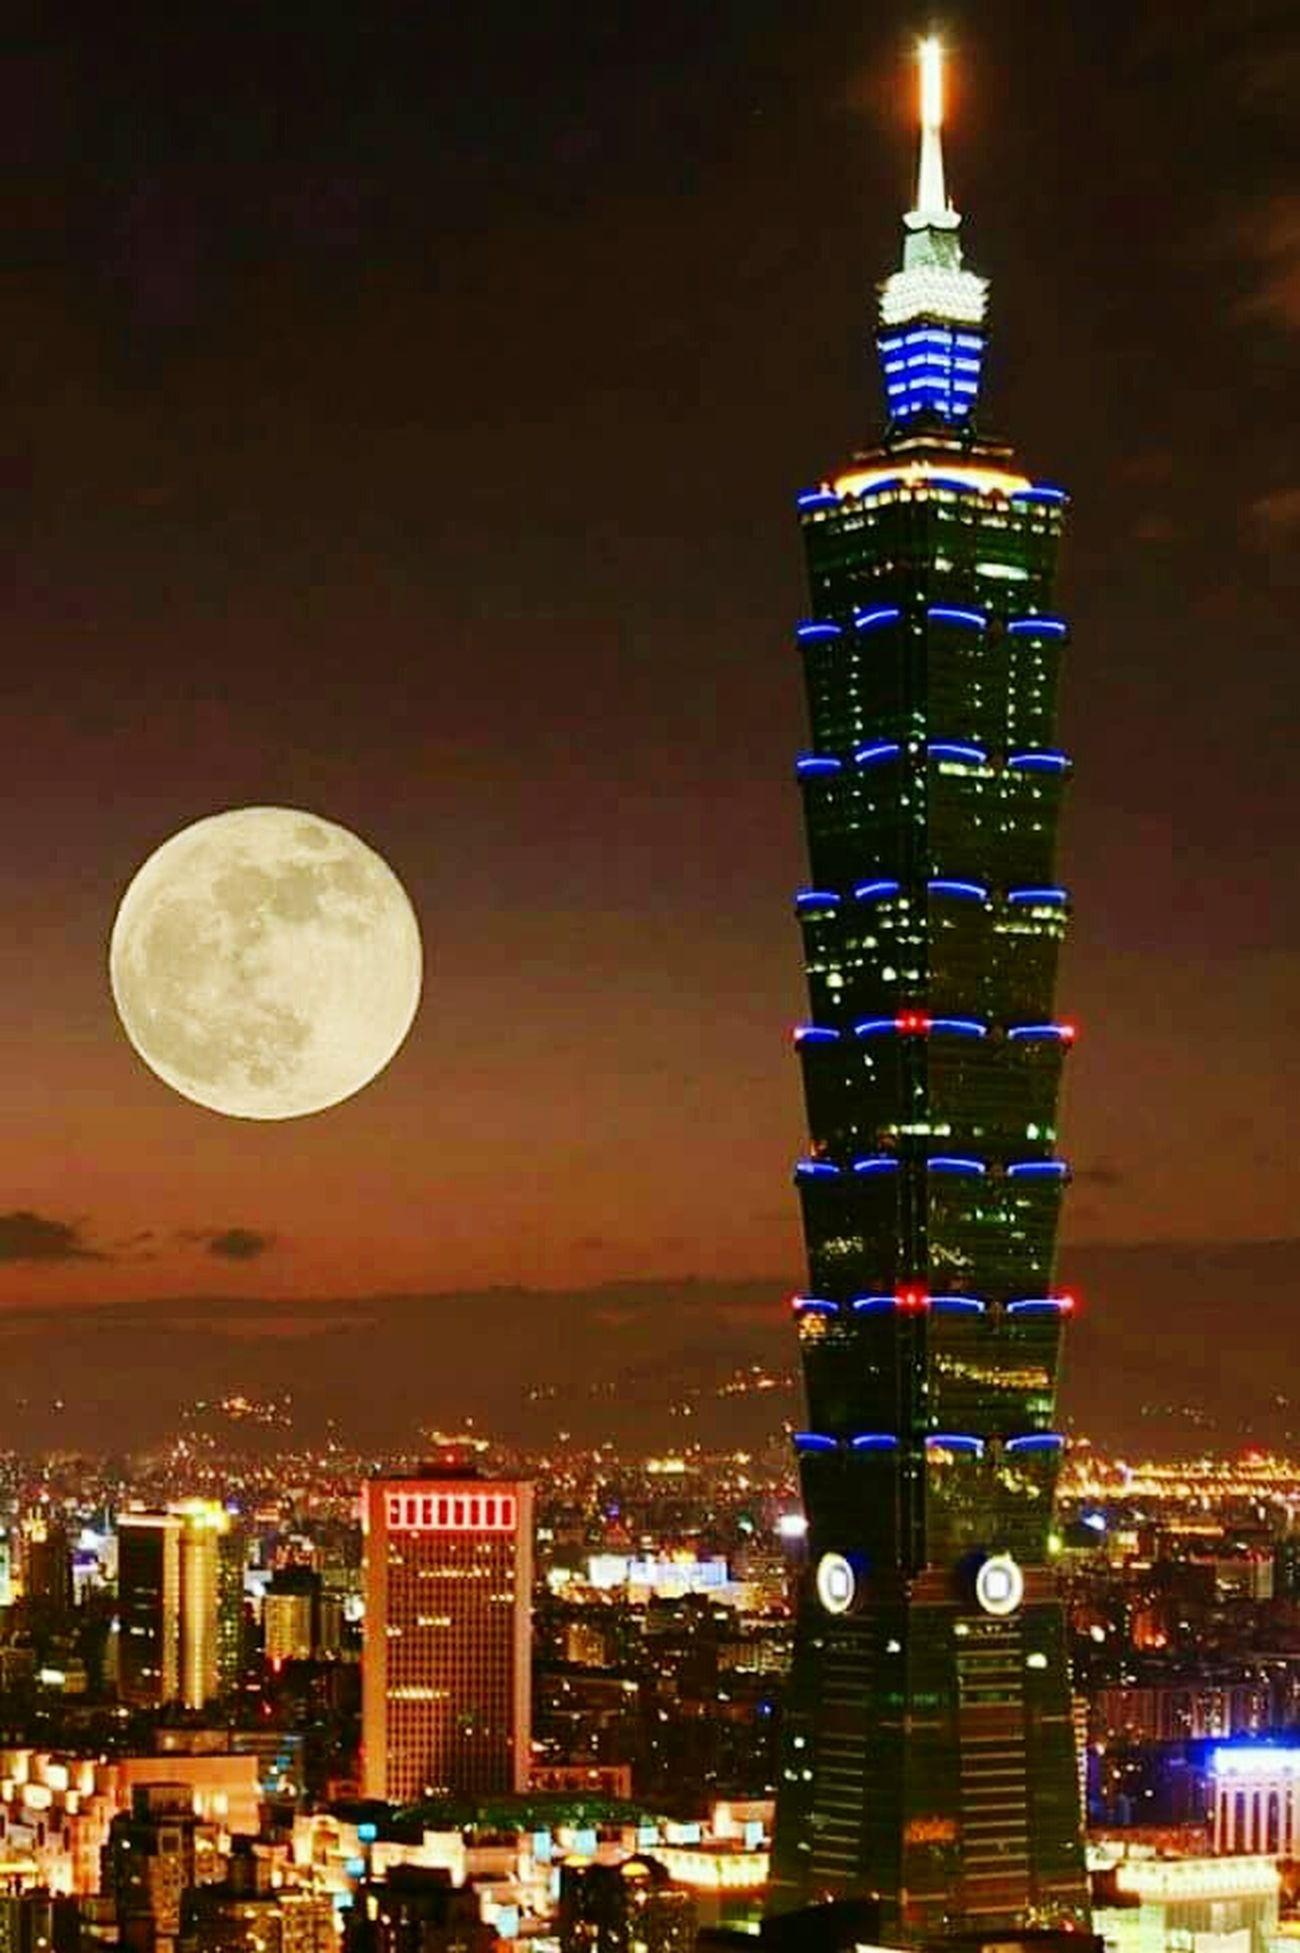 Moon Night City Building Exterior Outdoors Sky Tower Taipei101 Astronomy Moon Surface Full Moon Supermoon Wonderful Moment Taipei, Taiwan Street Light Light And Dark Urbanphotography EyeEm Nature Lover Nikon_photography_ EyeEm Best Edits Wonderful Time Wonderful Nature